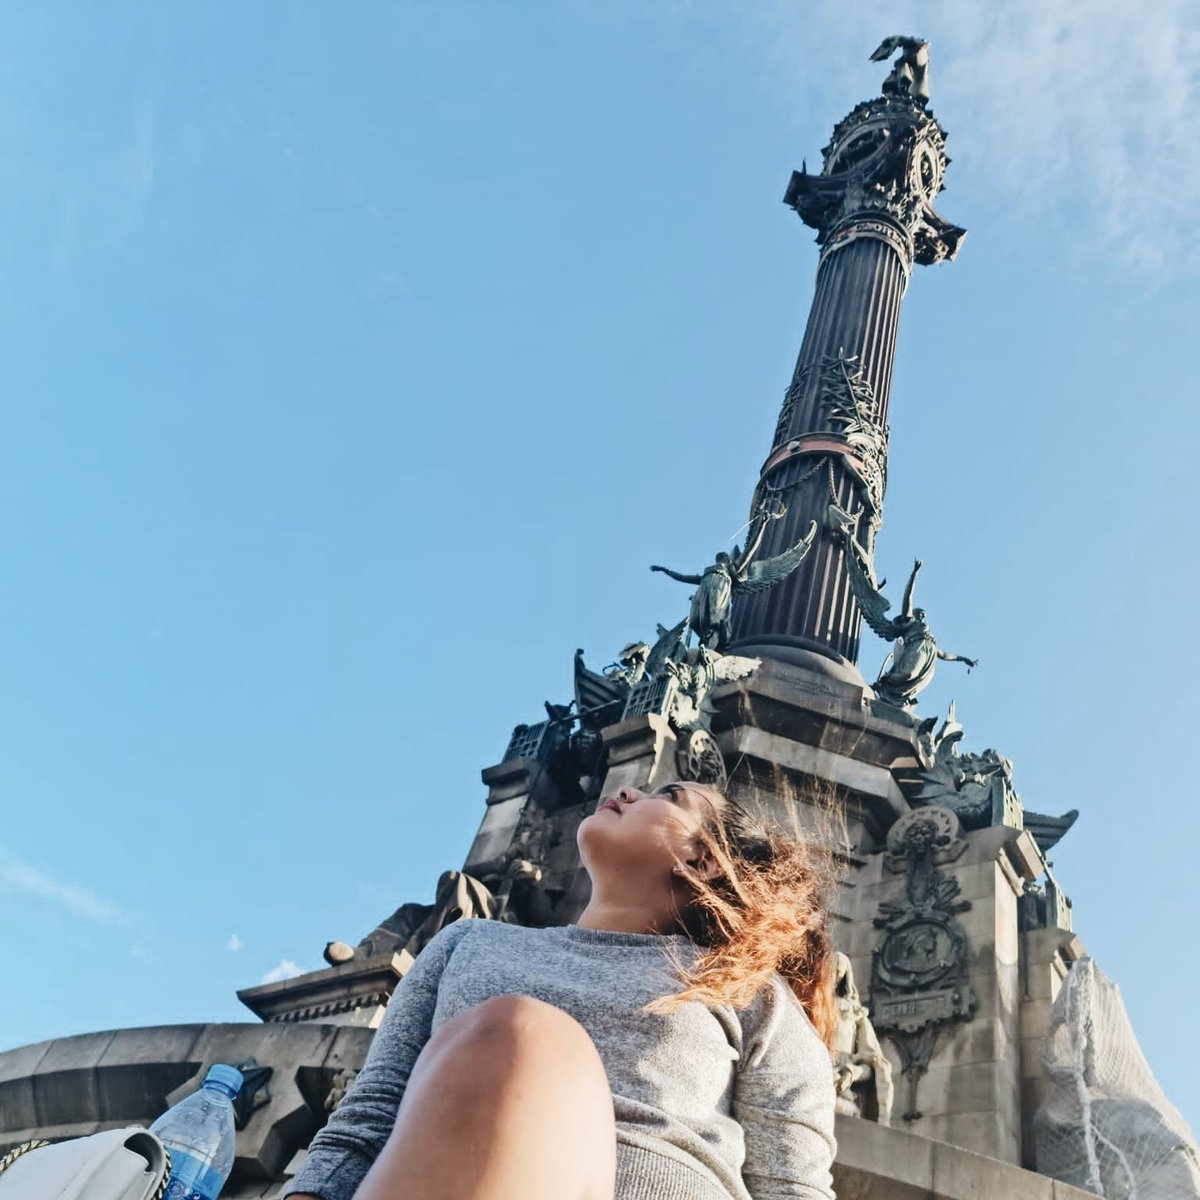 #NuevaFotoDePerfil #Barcelona #cristobalcolon #verano2020 https://t.co/P2HoEou3rB